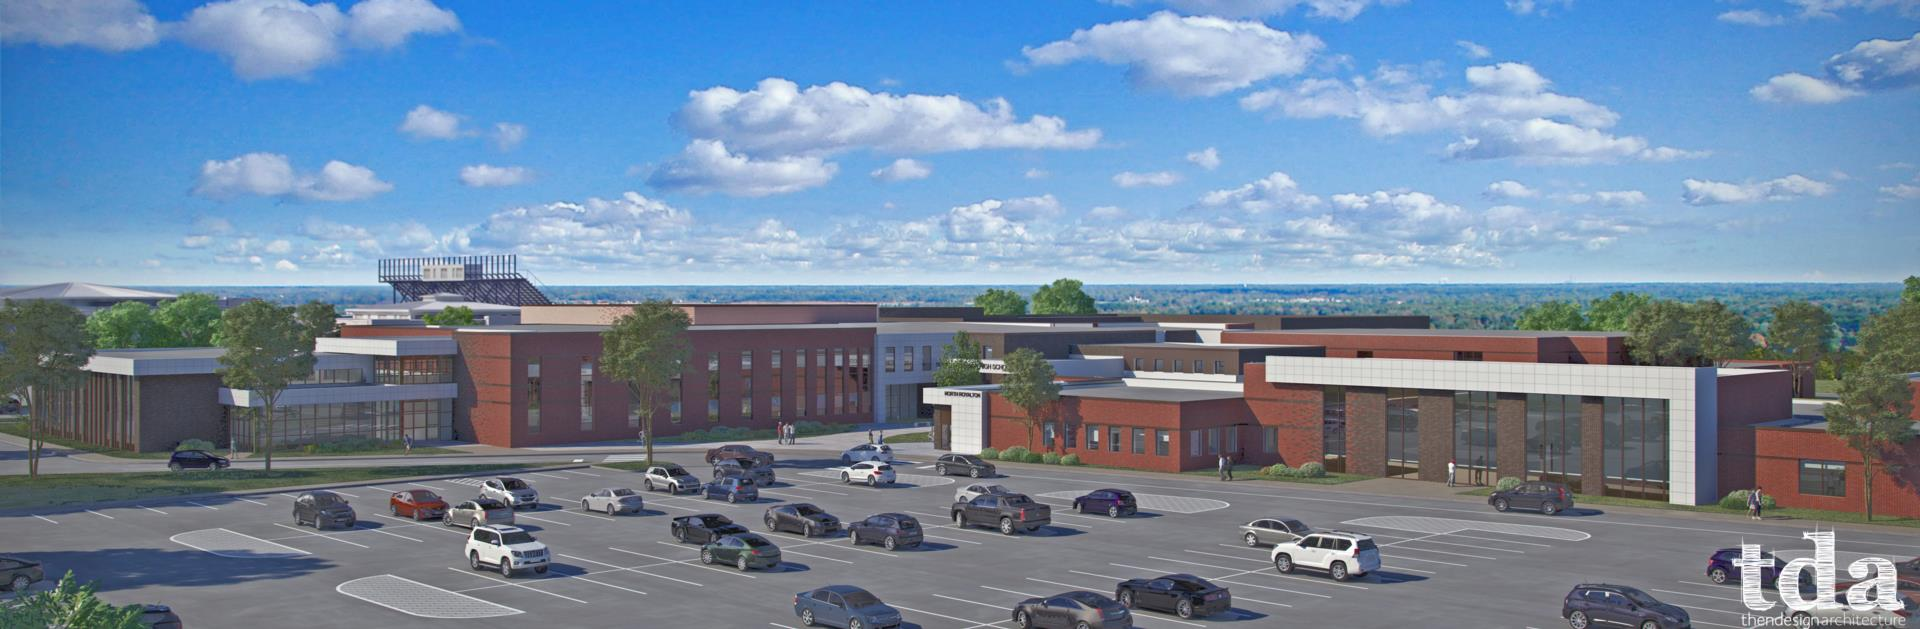 North Royalton High School aerial photo